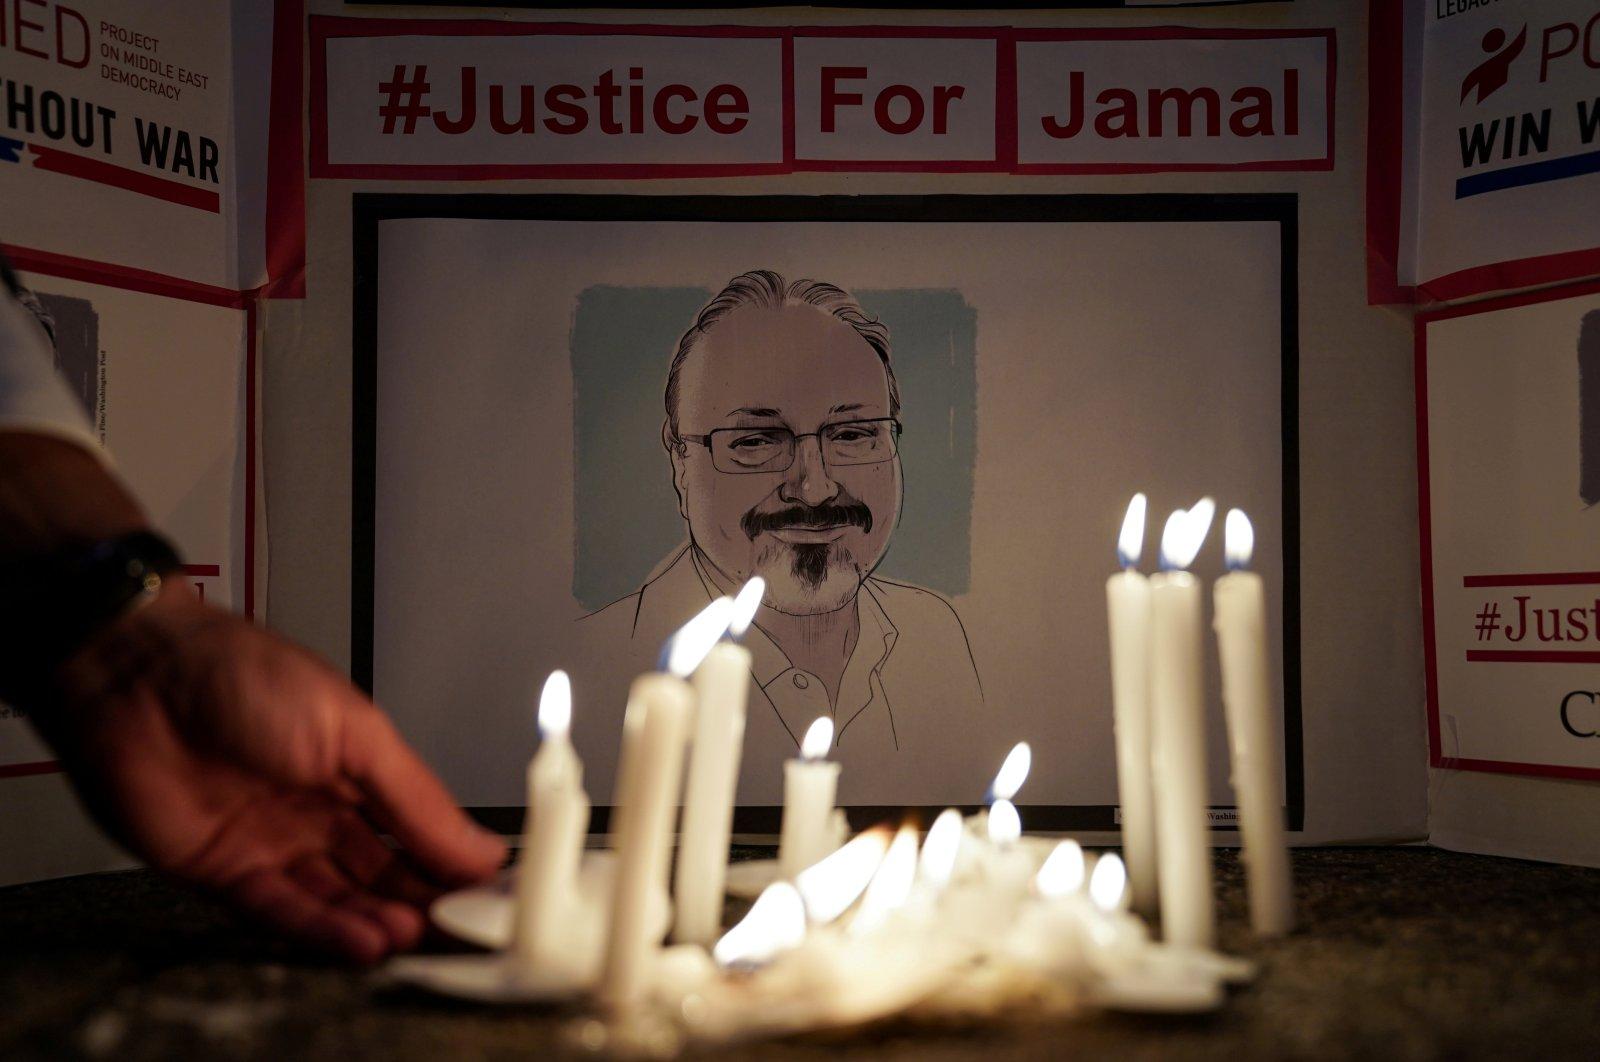 People hold a candlelight vigil to mark the anniversary of slain journalist Jamal Khashoggi, in front of the Saudi Embassy in Washington, D.C., Oct. 2, 2019. (Reuters Photo)